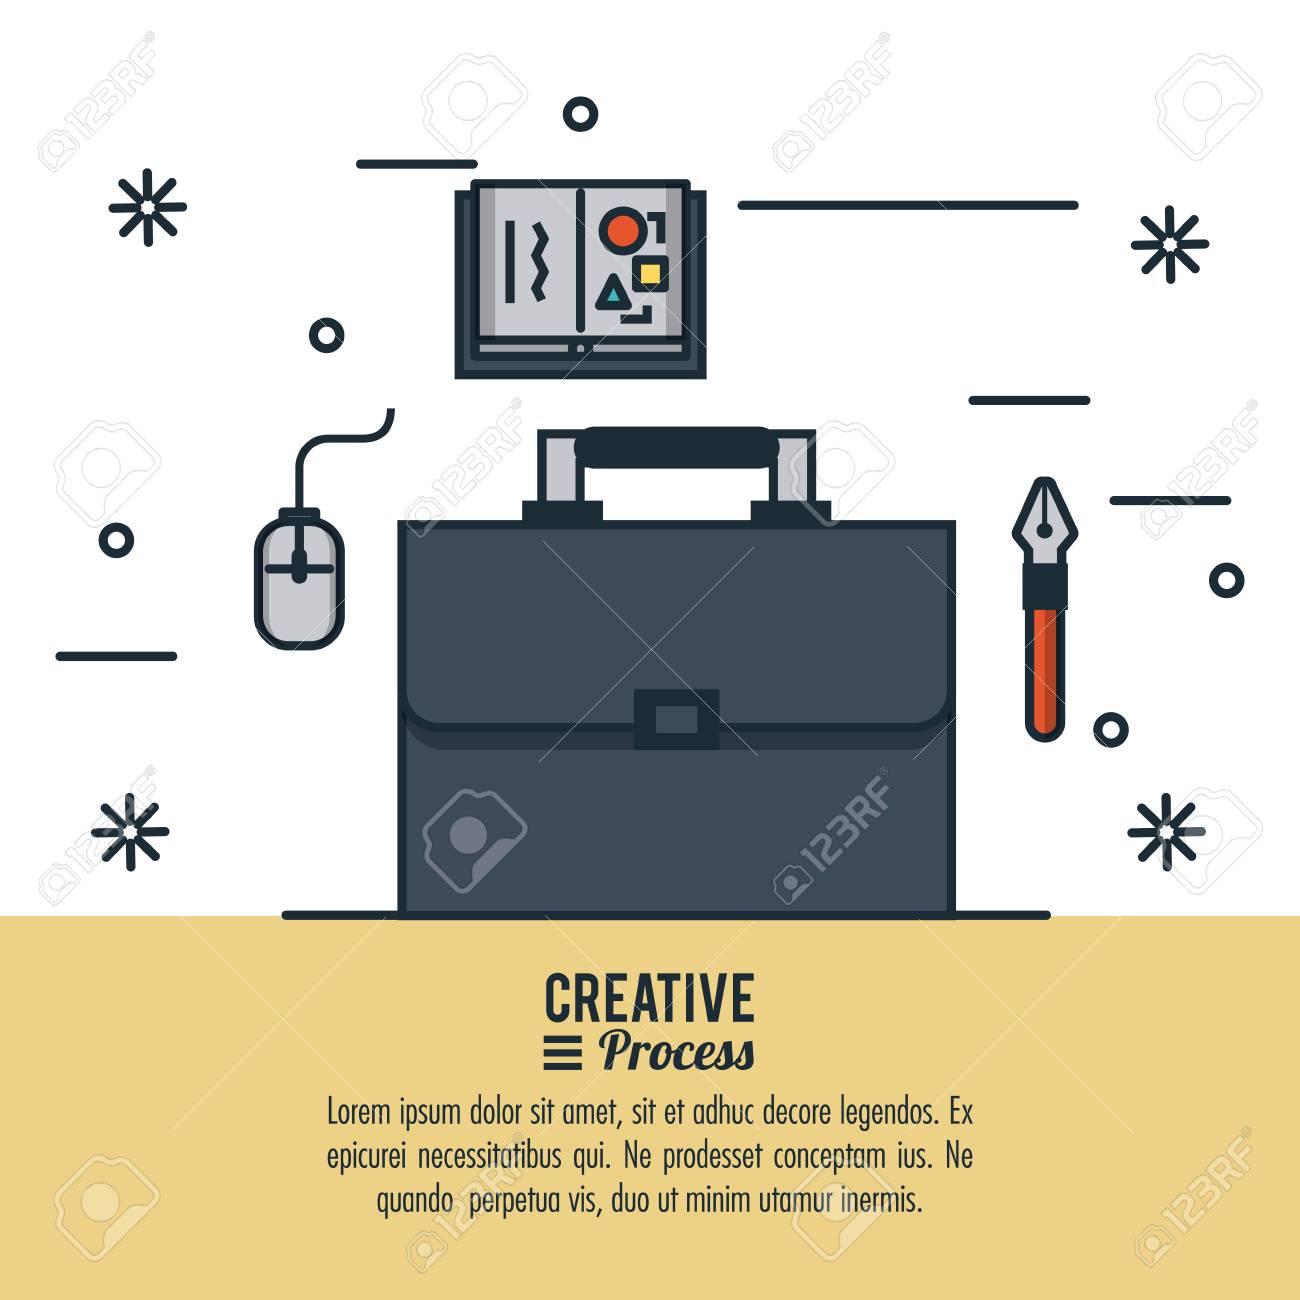 Creative process infographic icon vector illustration graphic..